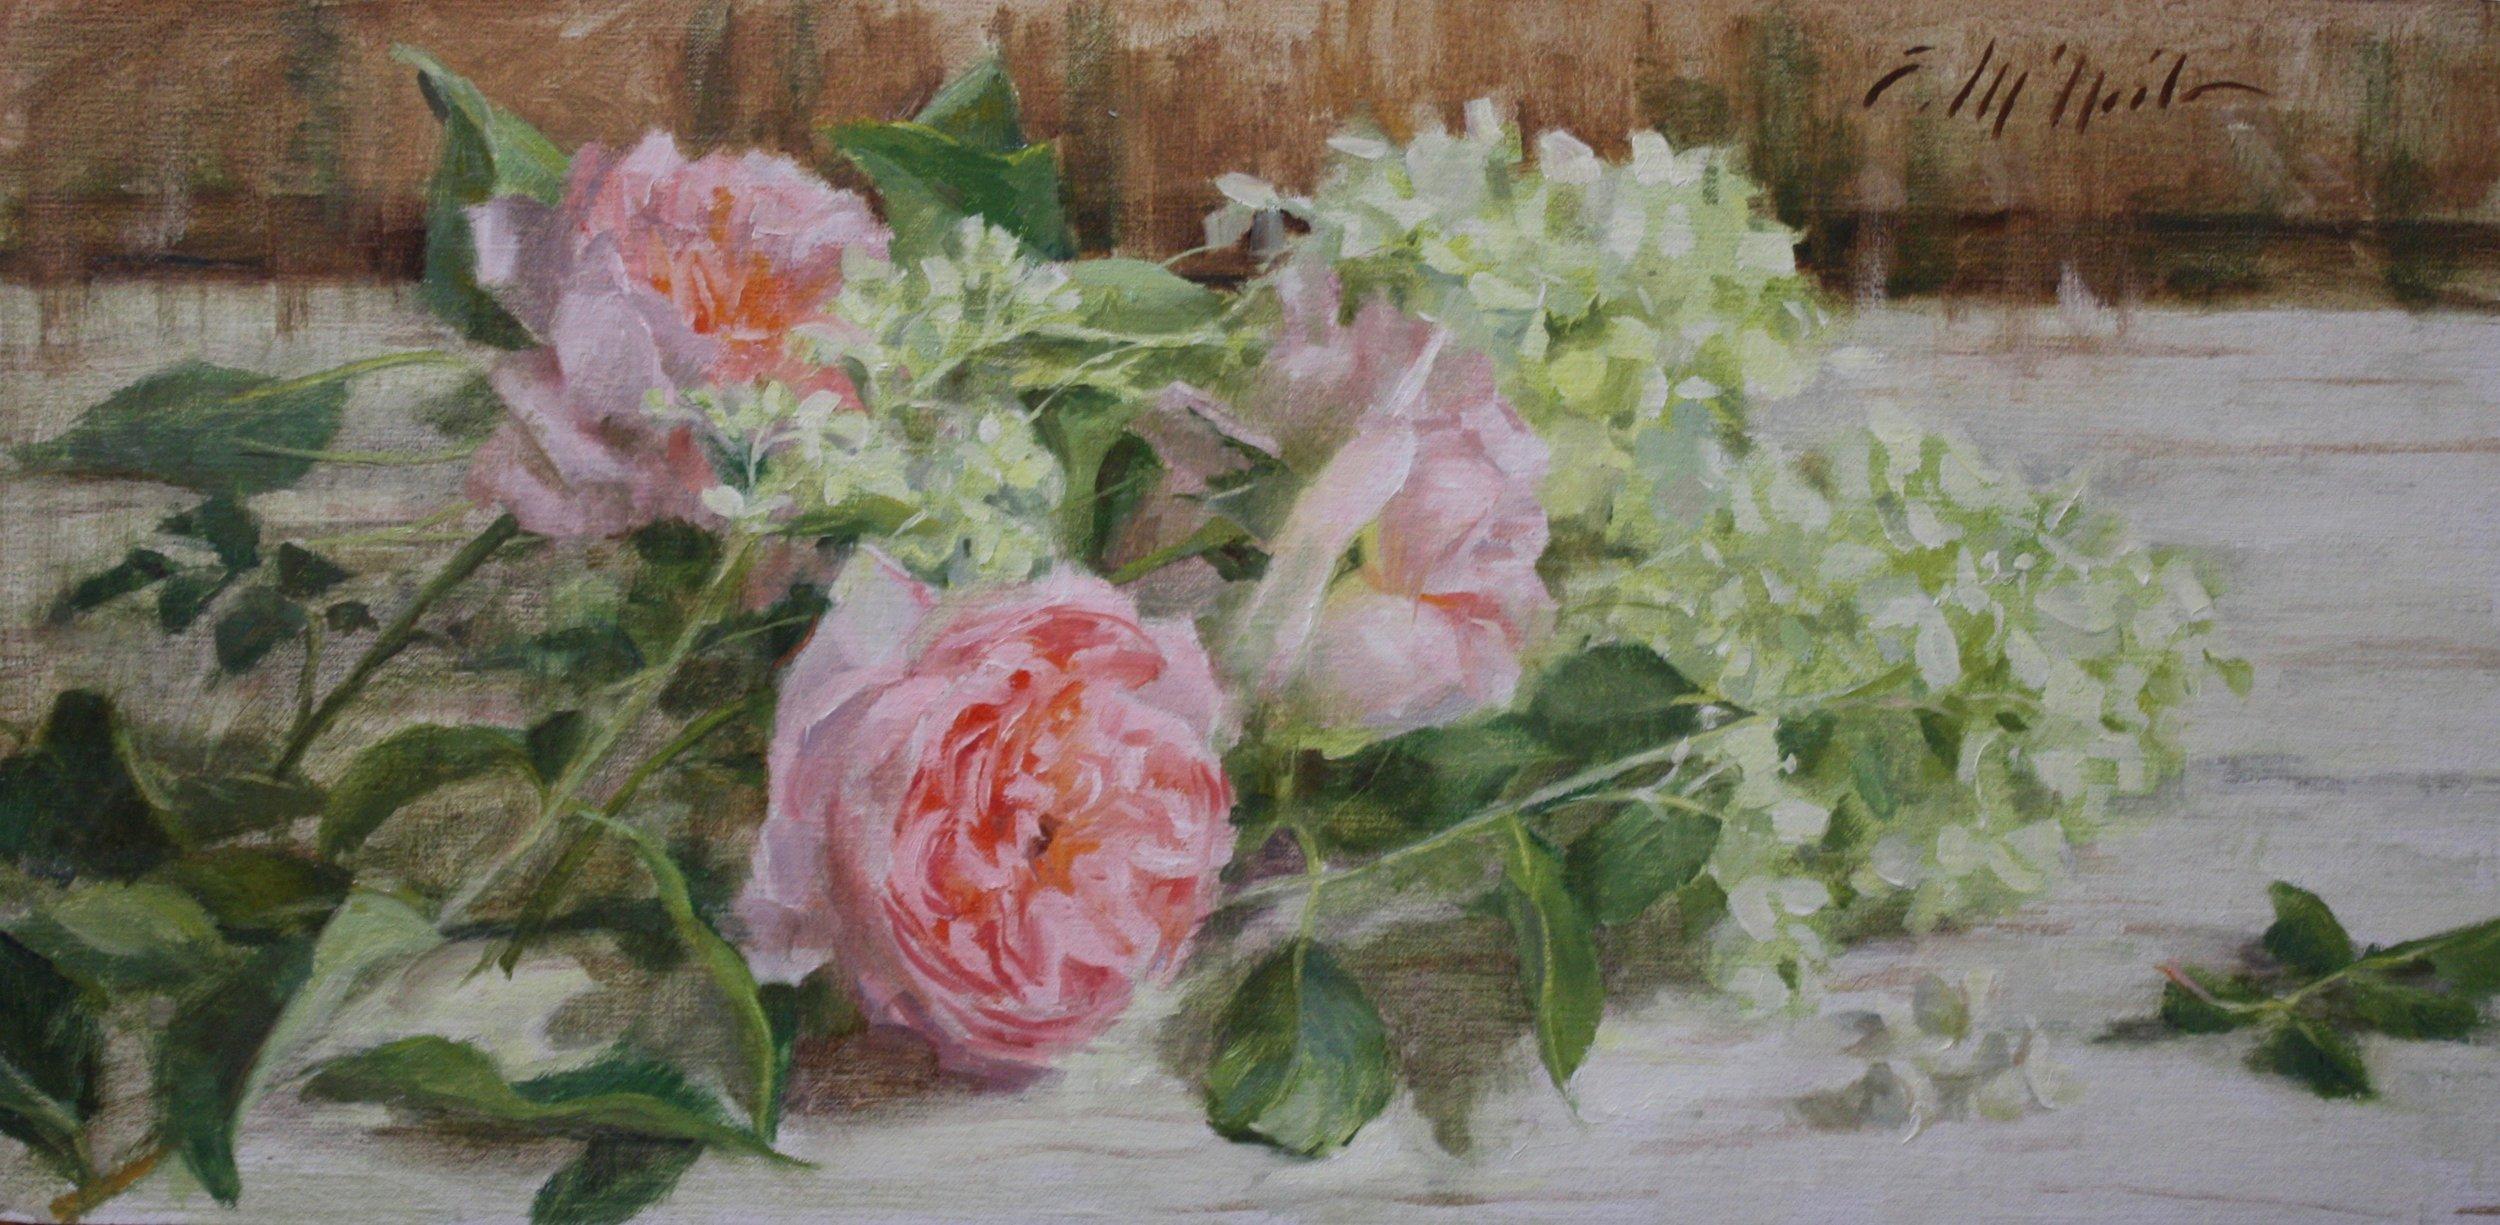 """Roses and Hydrangeas"" 8x16.5 $480"